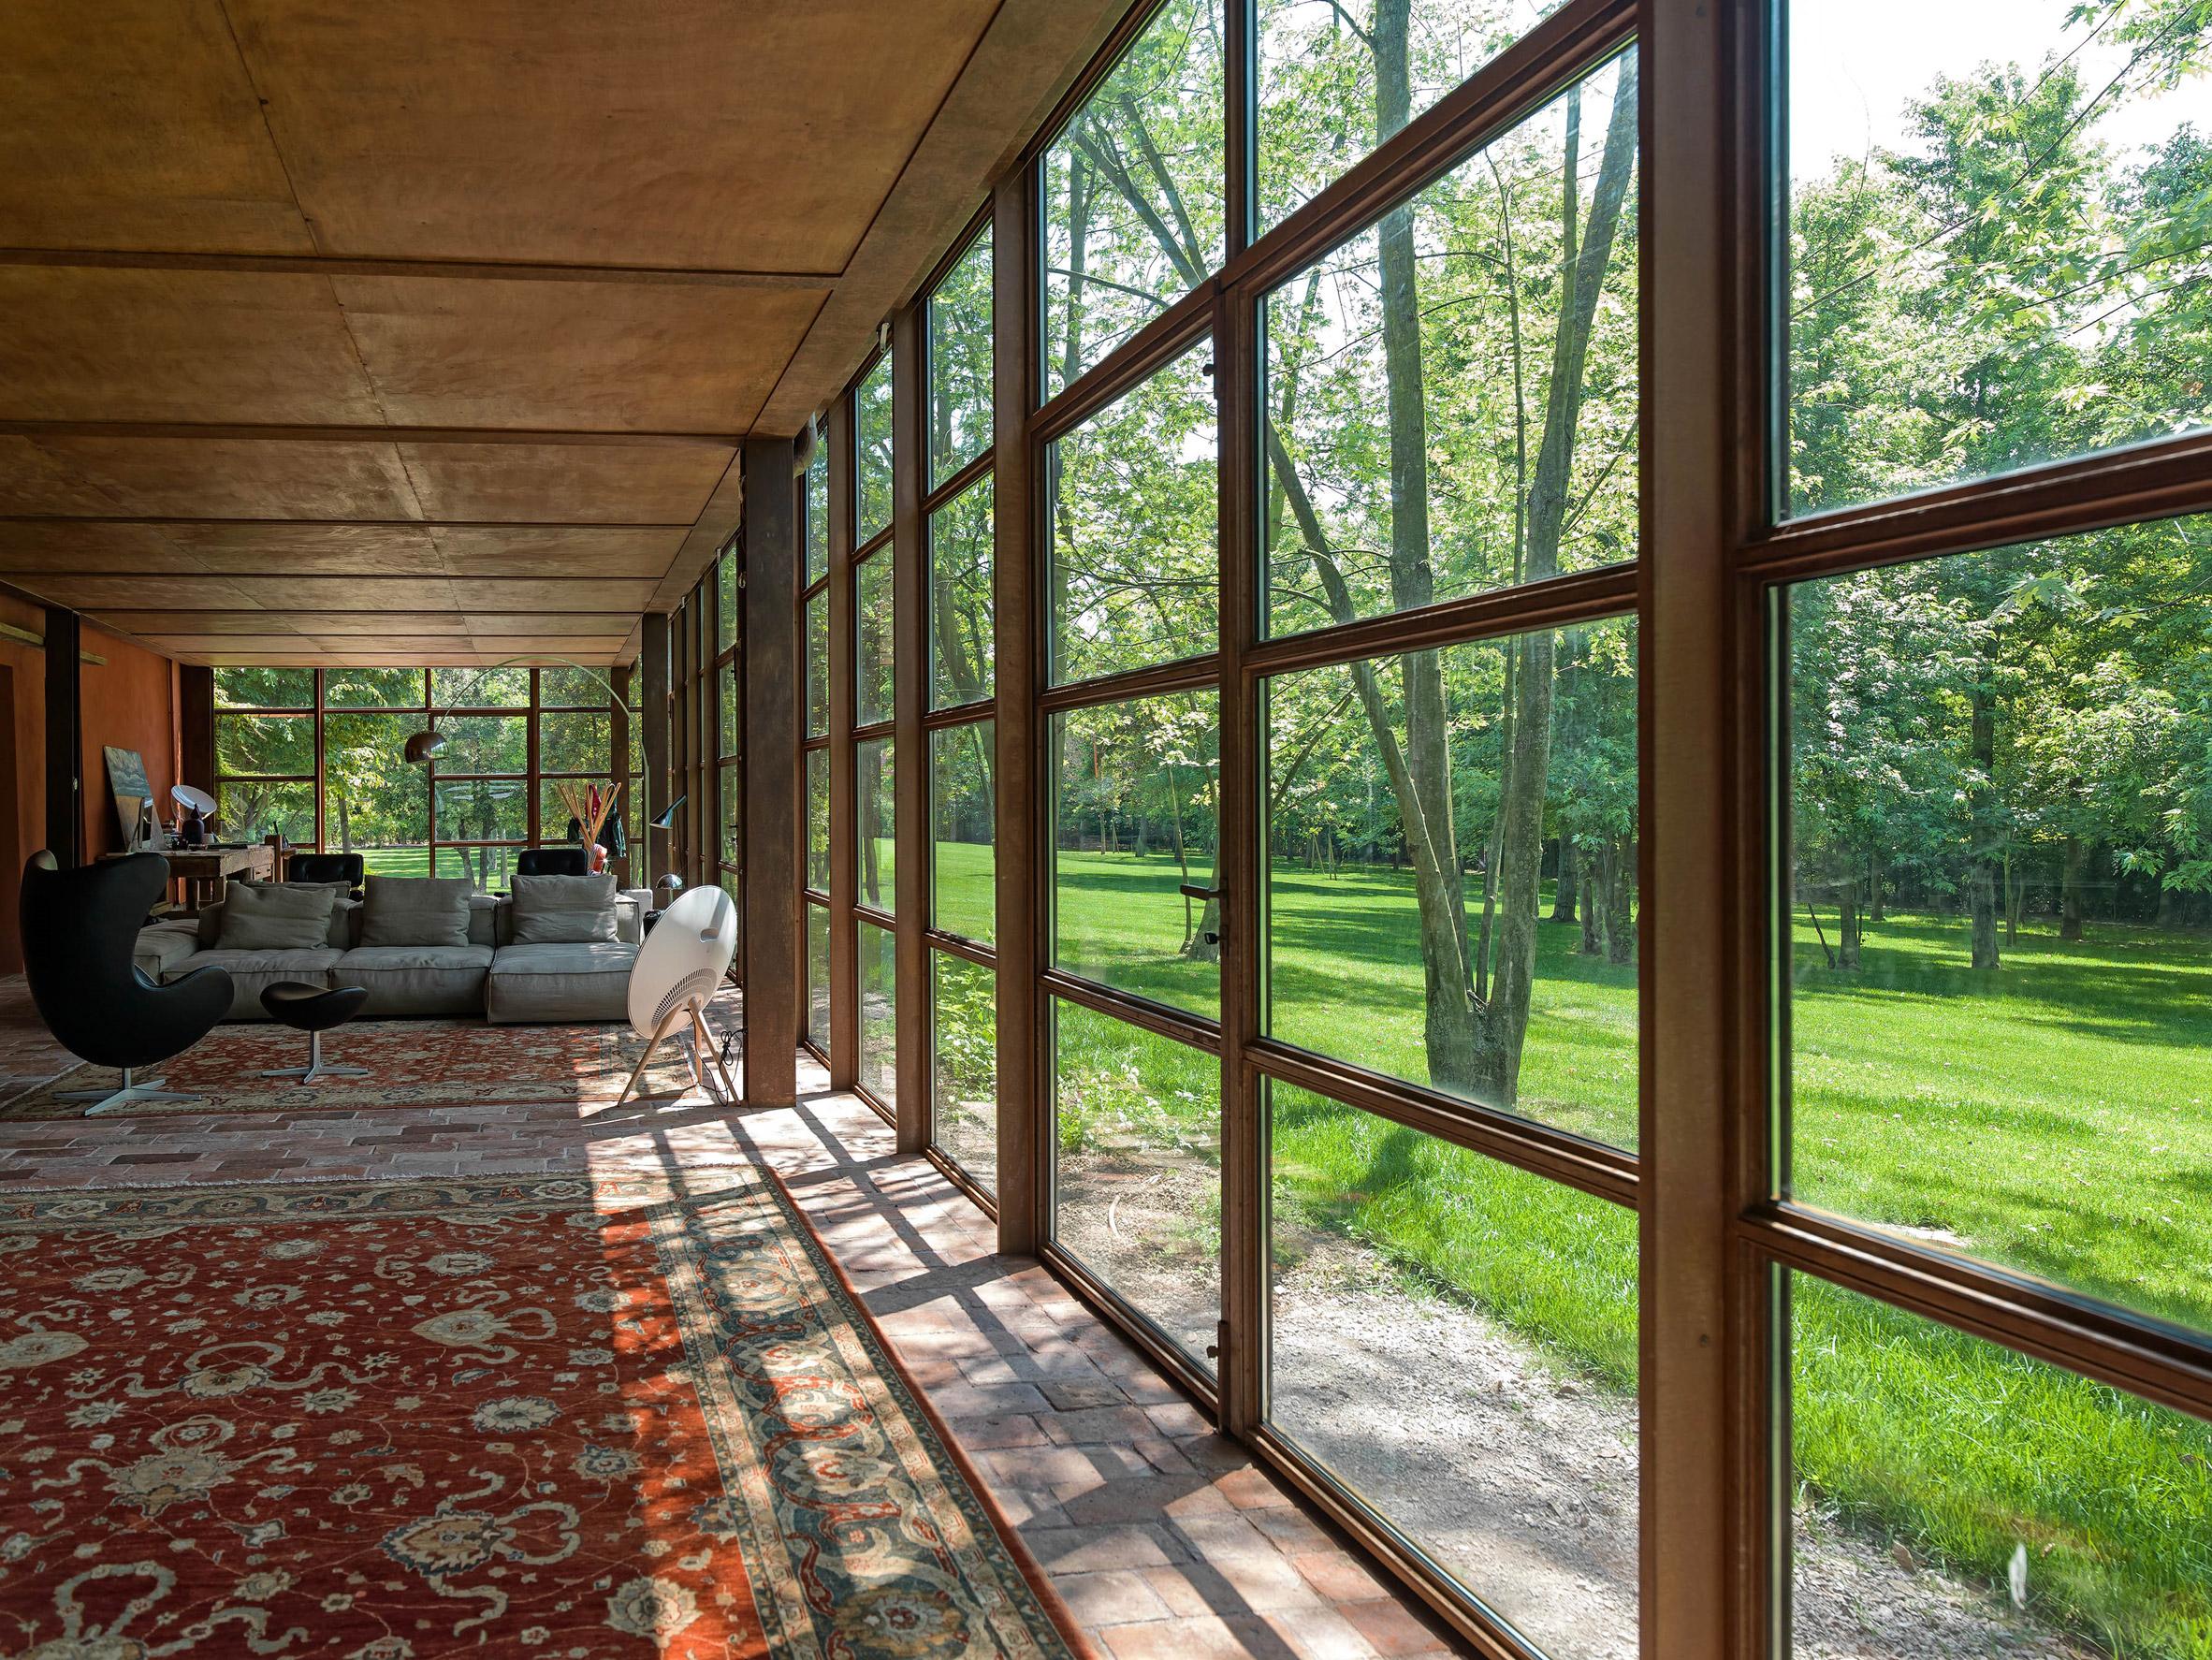 architecture-space-design-studia-interiors-osnovadesign-osnova-poltava_03